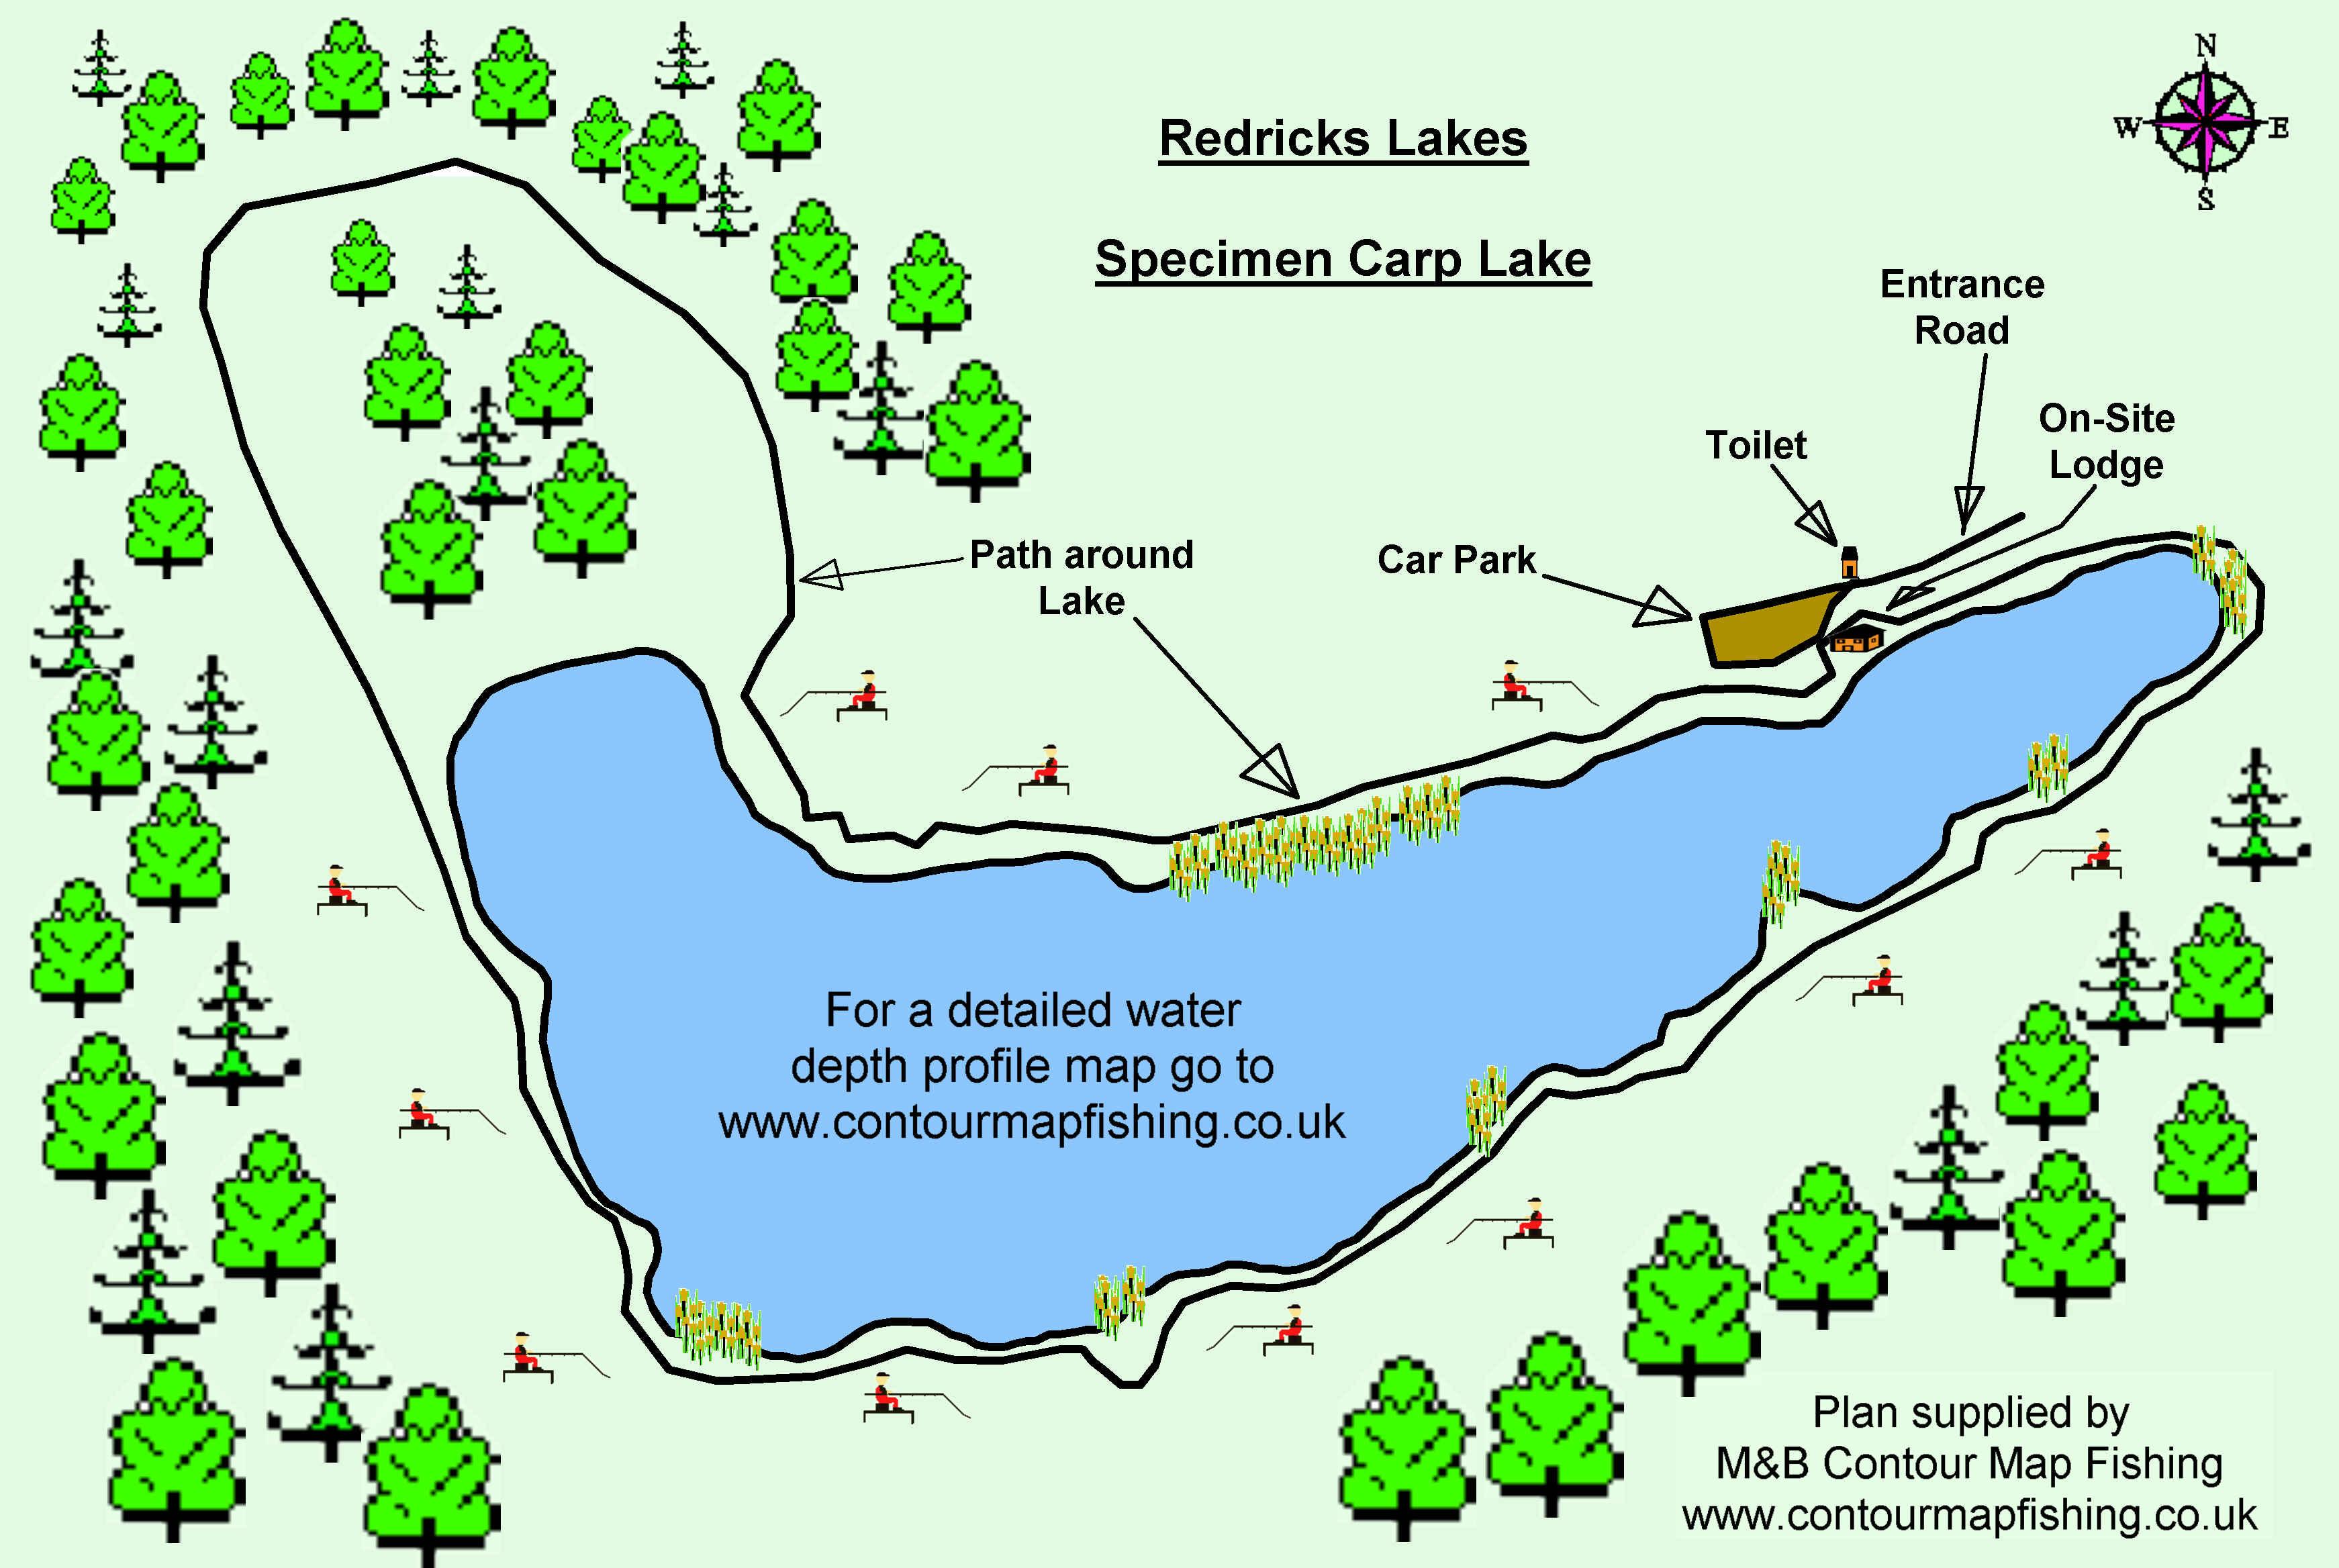 Awe Inspiring Redricks Specimen Carp Lake Largest Home Design Picture Inspirations Pitcheantrous